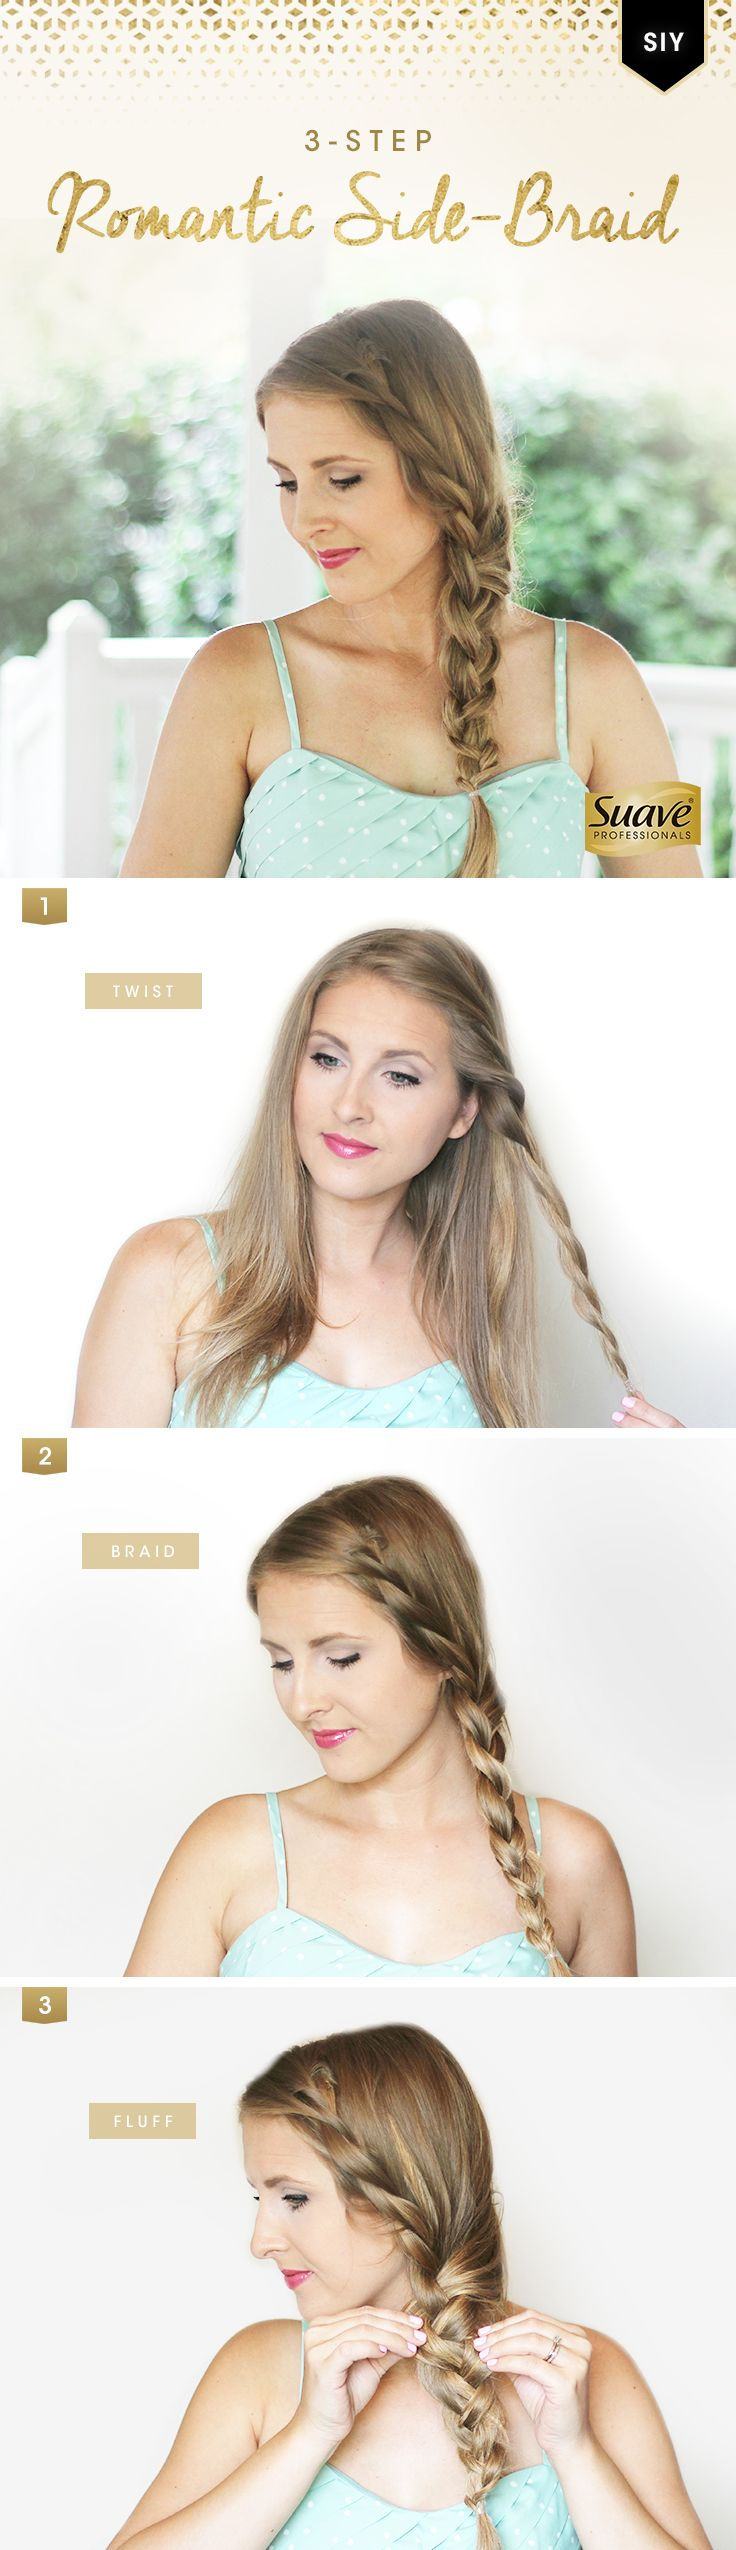 Best 25+ Side braid hairstyles ideas on Pinterest | Braid ...